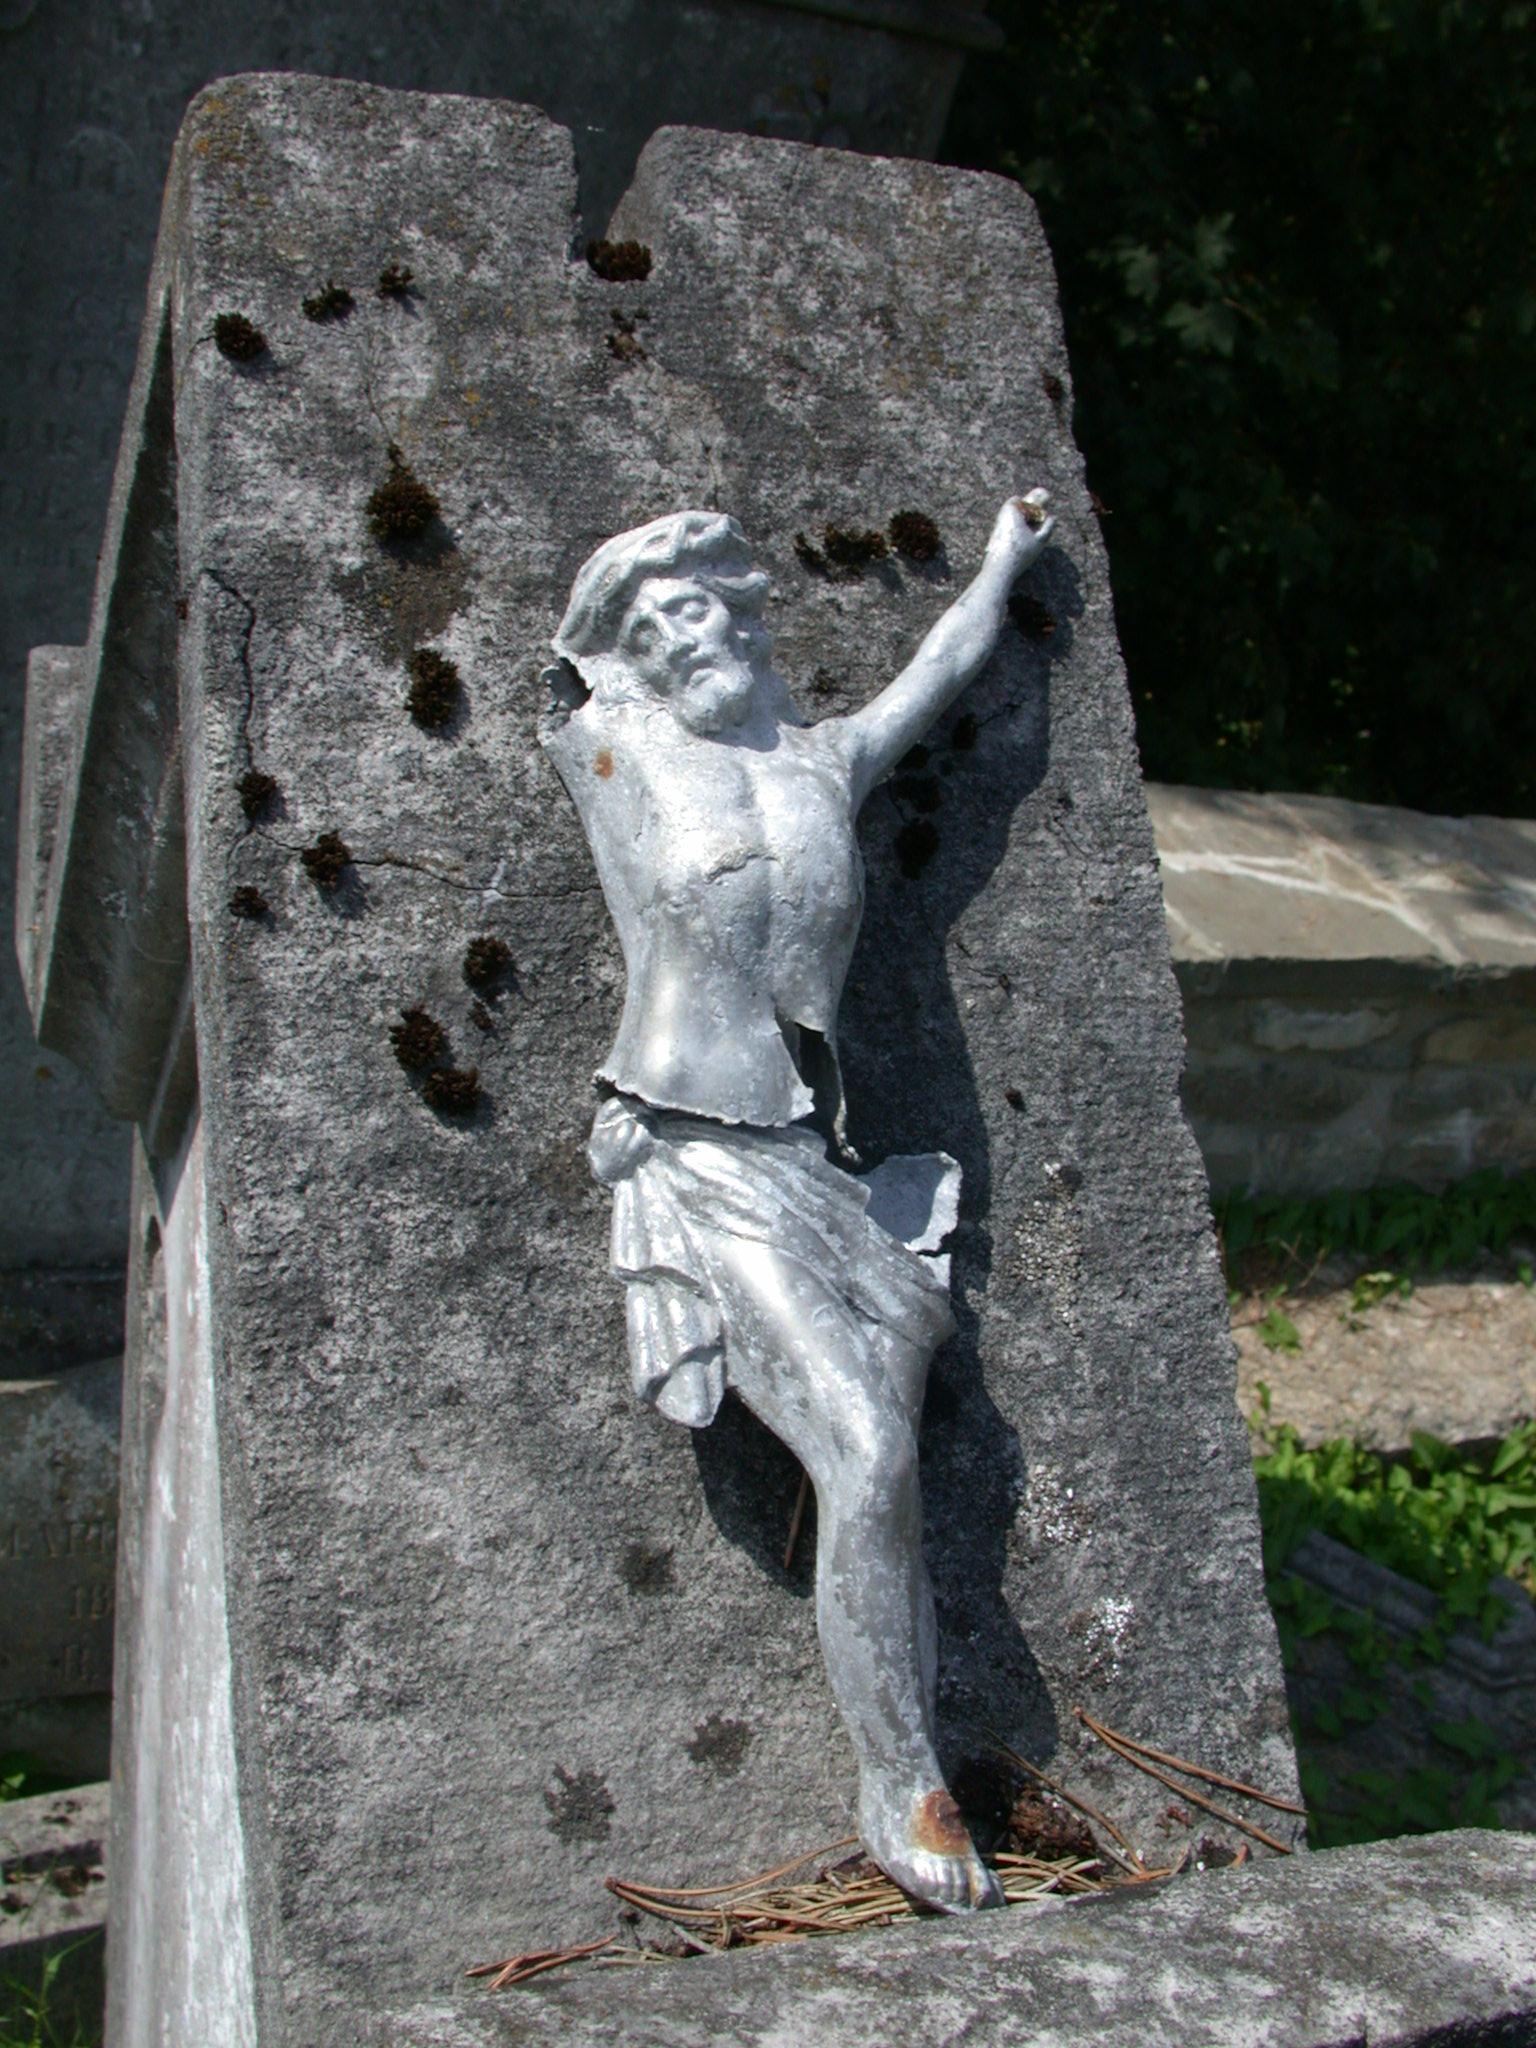 image.php?image=b5art_sculptures008.jpg&